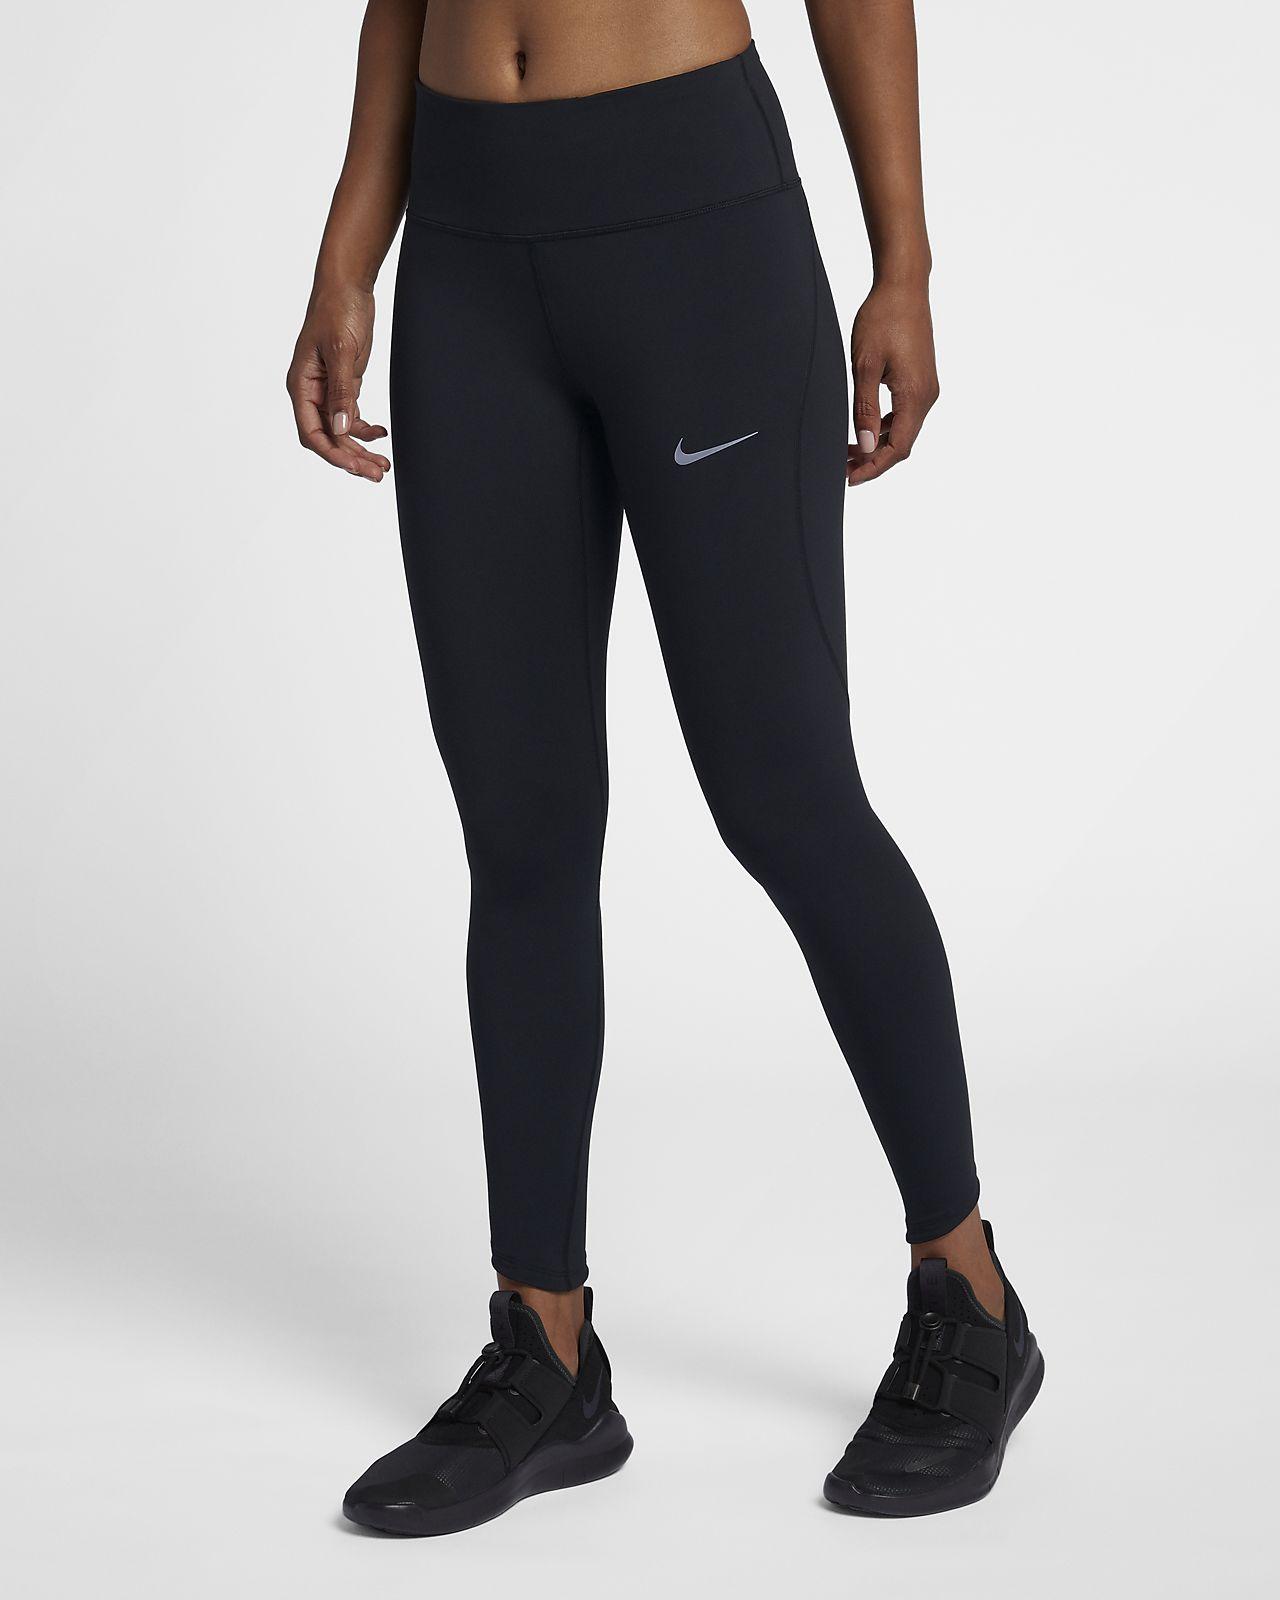 super specials shoes for cheap shop Nike Epic Lux 7/8-Lauf-Tights mit hohem Bündchen für Damen